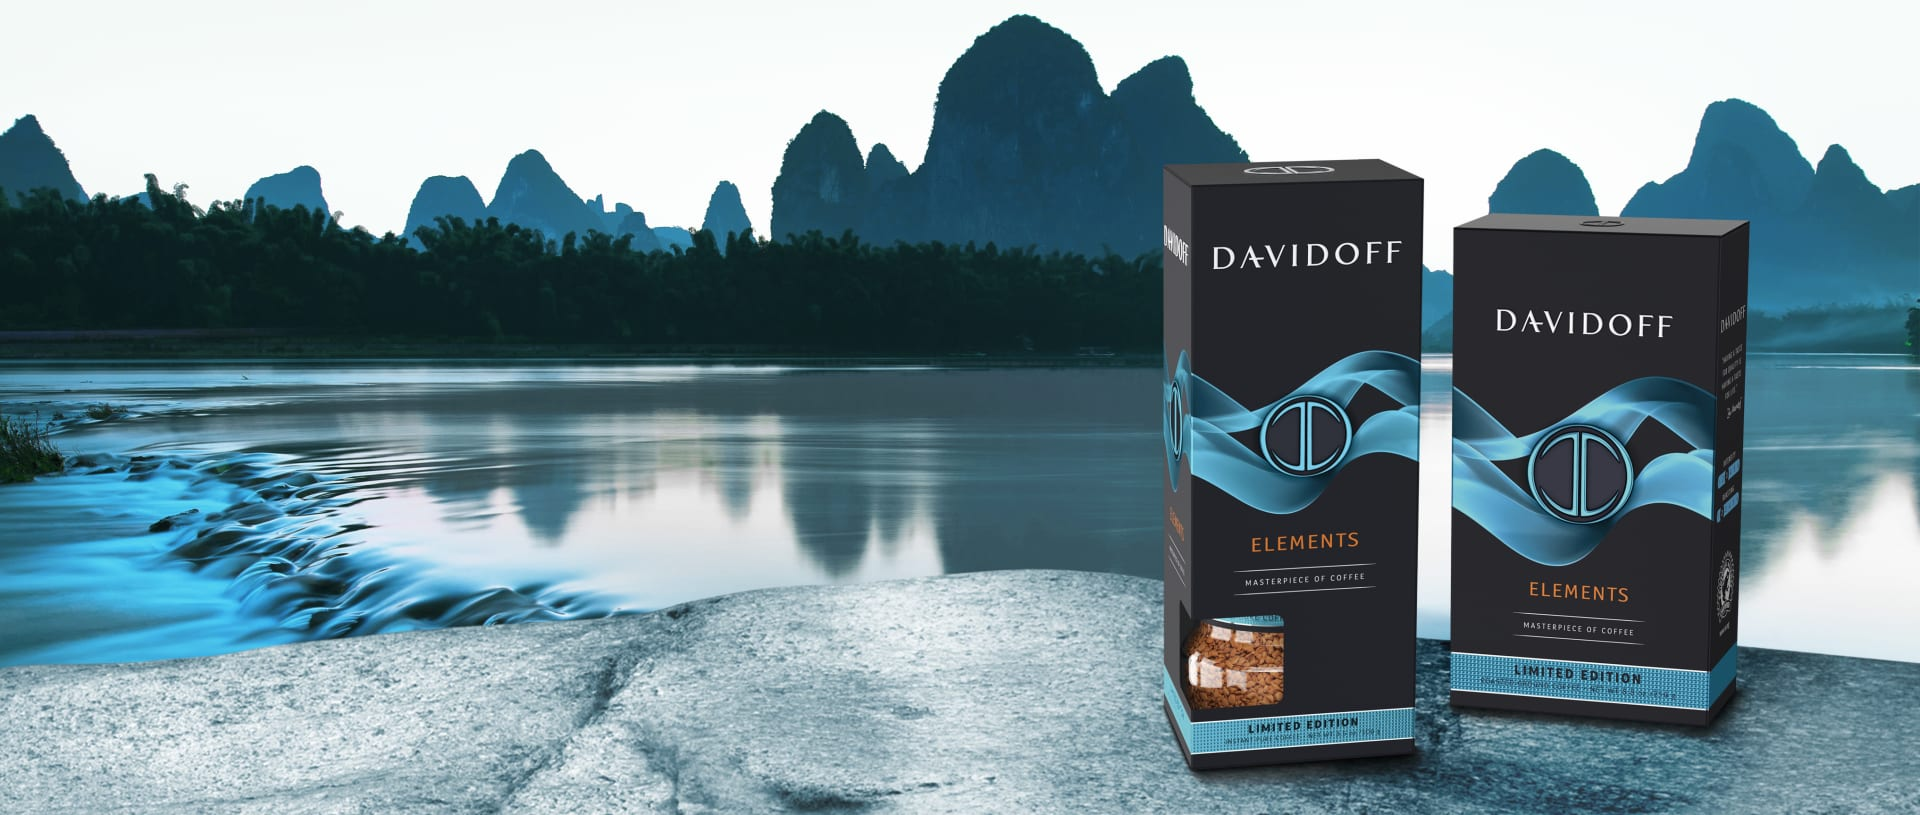 DAVIDOFF Coffee limited edition elements